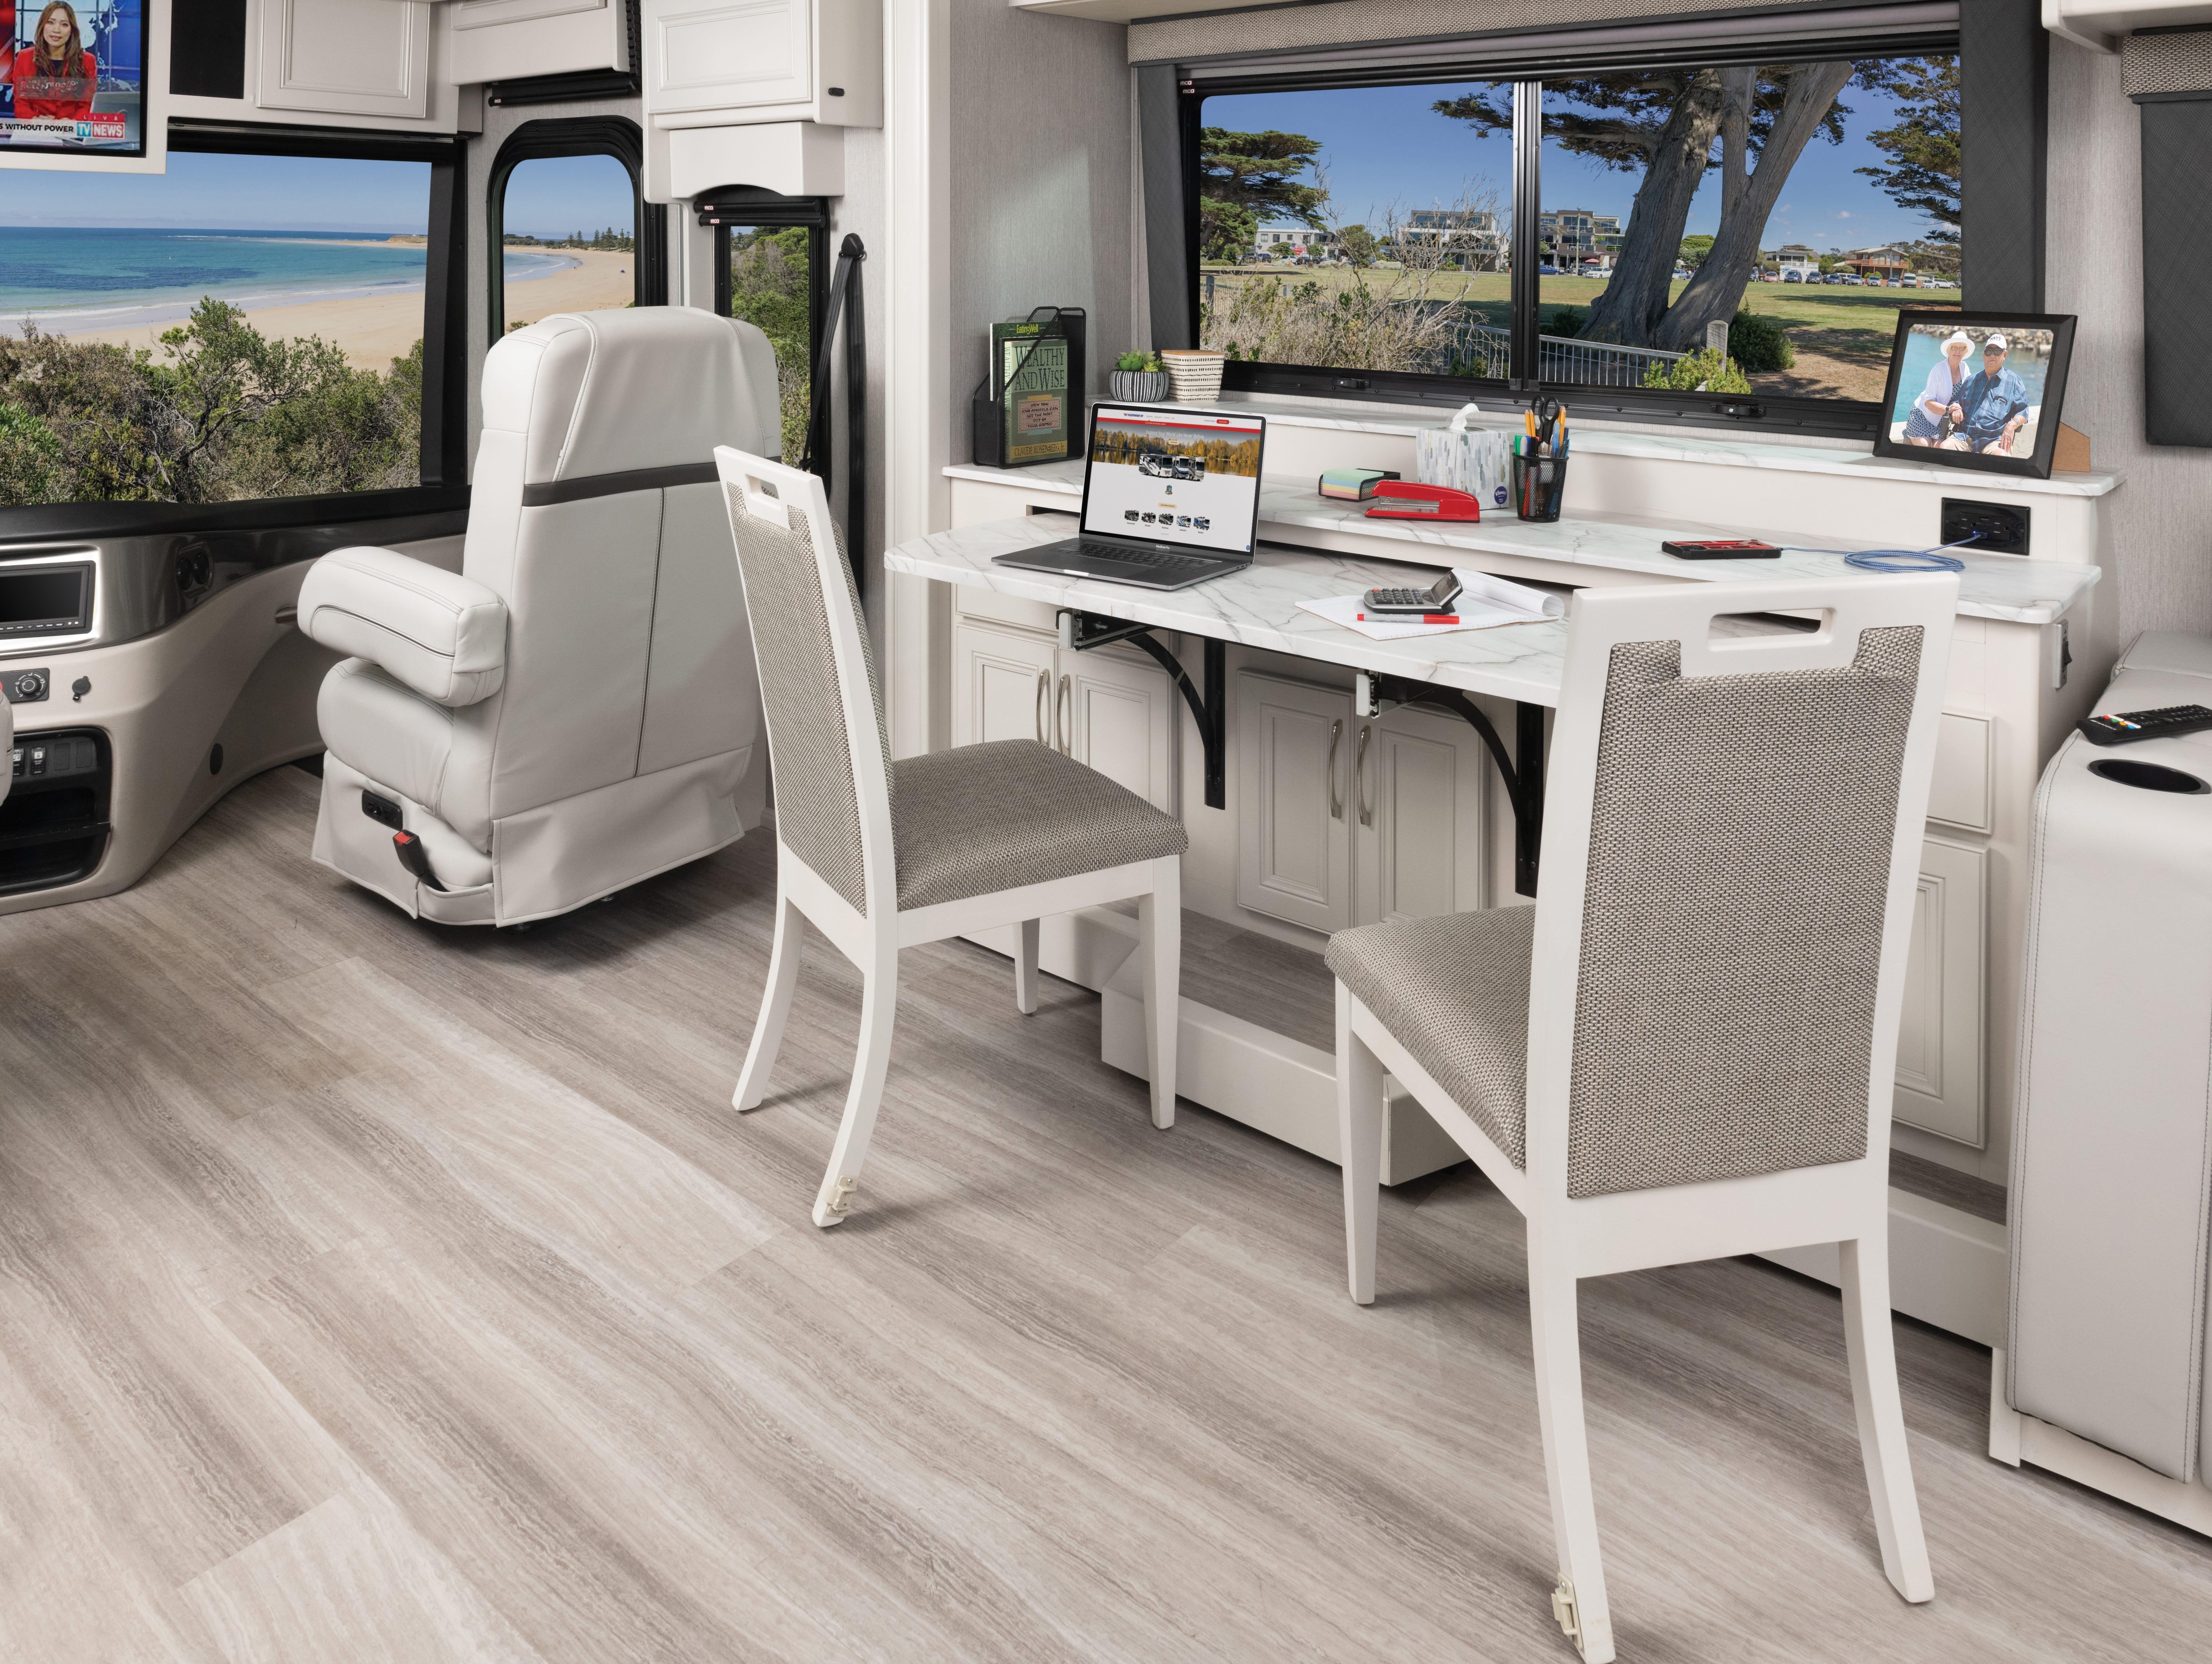 4 adaptable Frontier33 SS anchor heri MY22 3981 desk